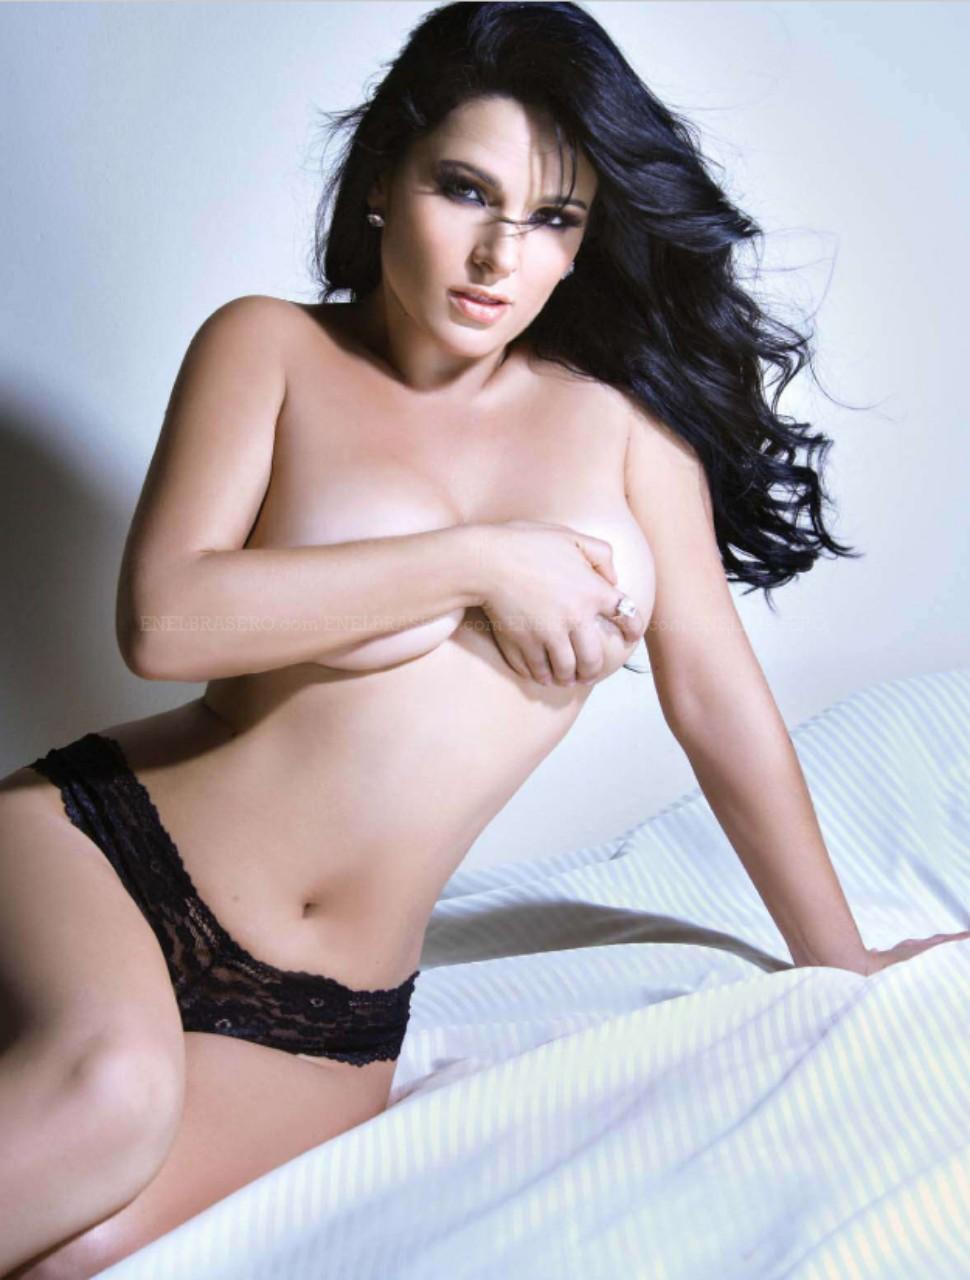 Marina visconti porn star